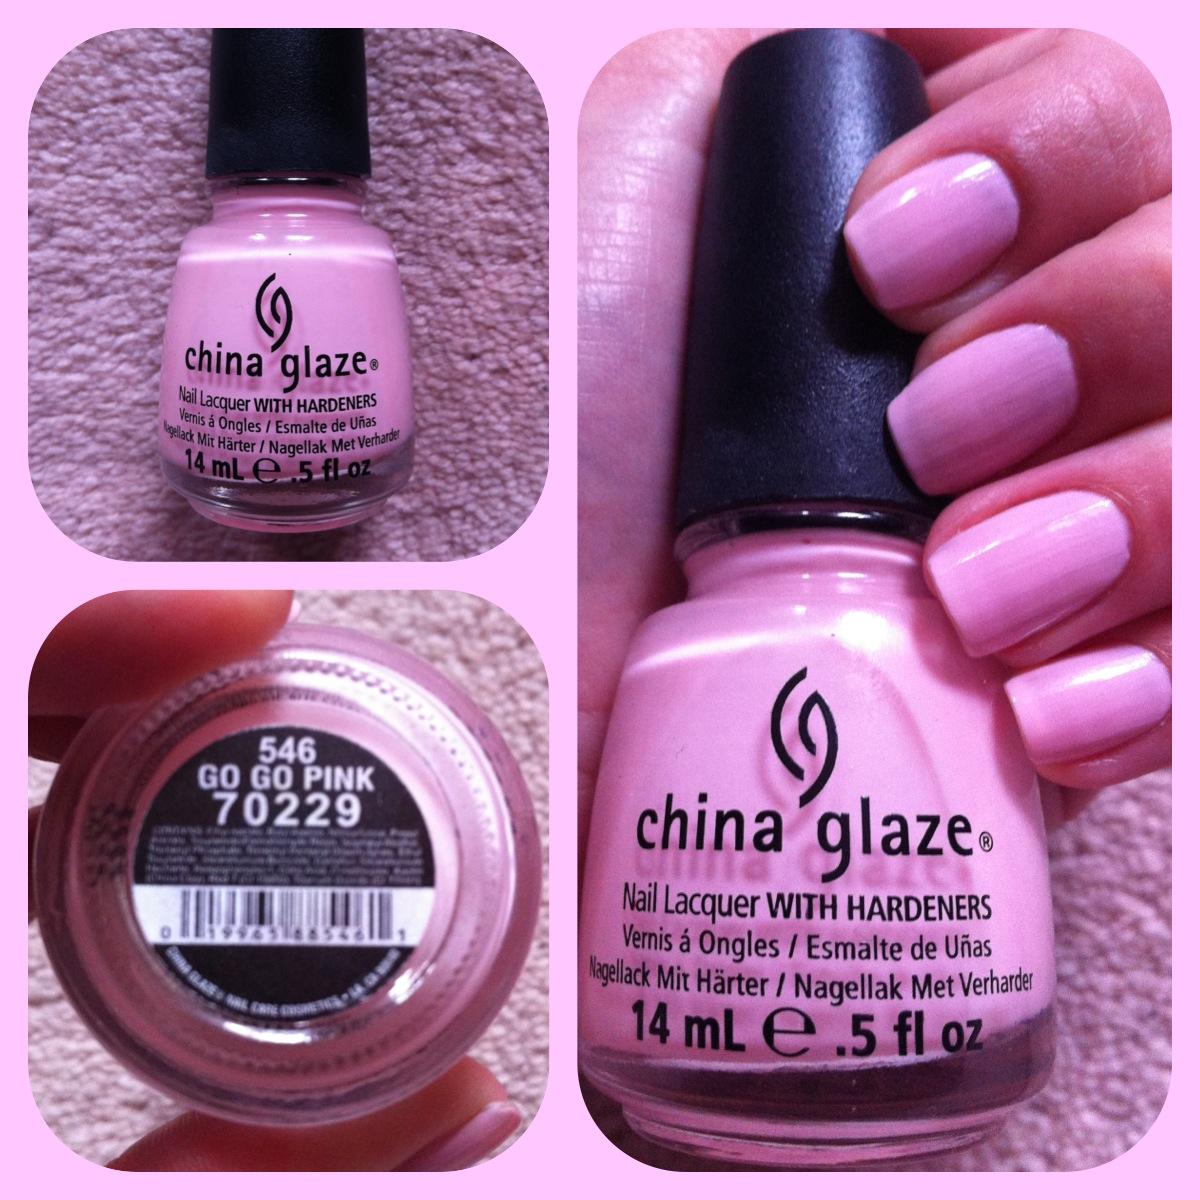 China Glaze Red Nail Polish: NOTD: China Glaze - Go Go Pink